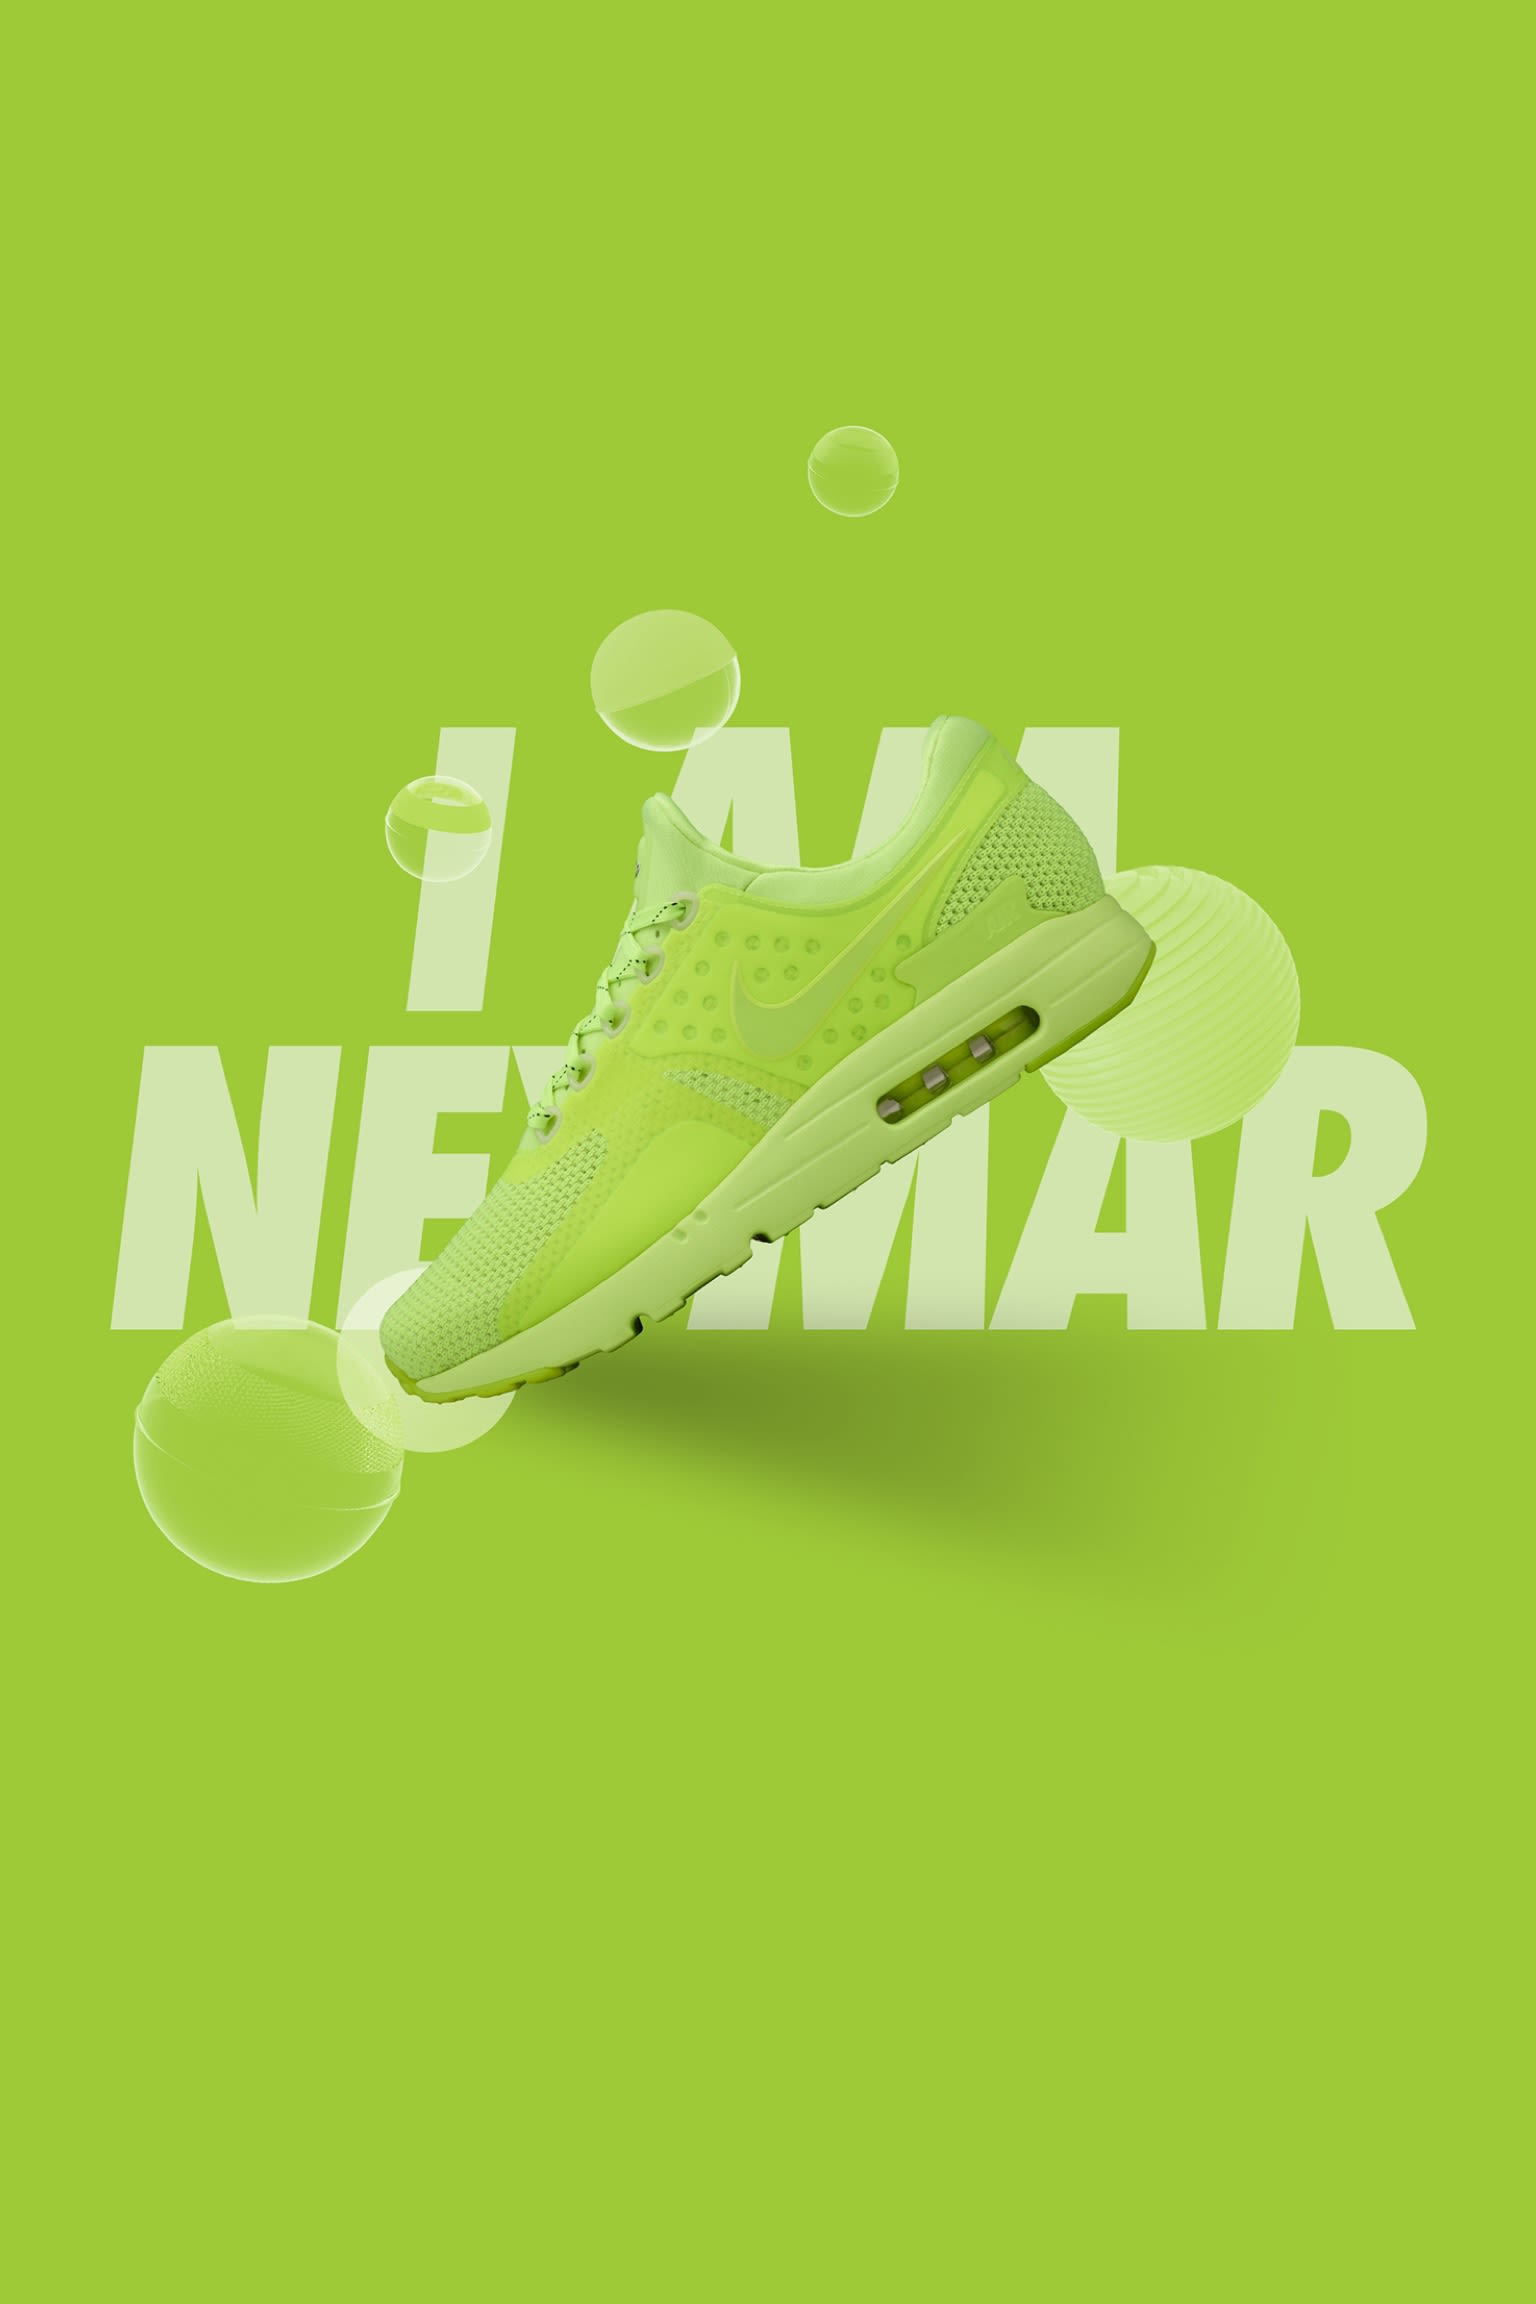 Nike Air Max Zero iD 'I Am Neymar' Release Date